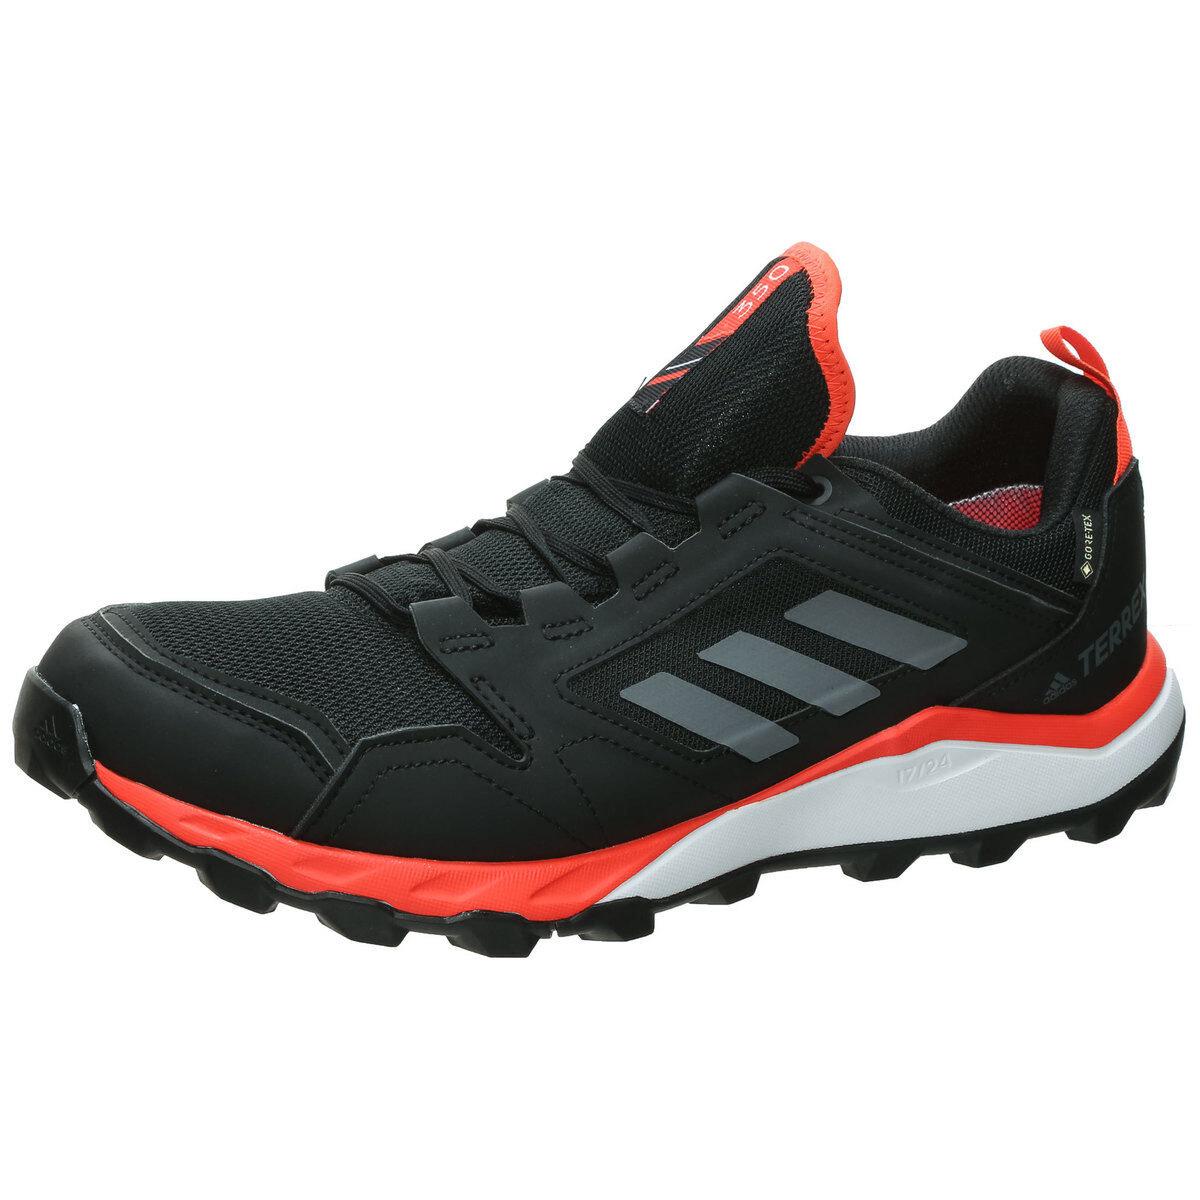 Adidas Terrex Agravic TR Gore-Tex